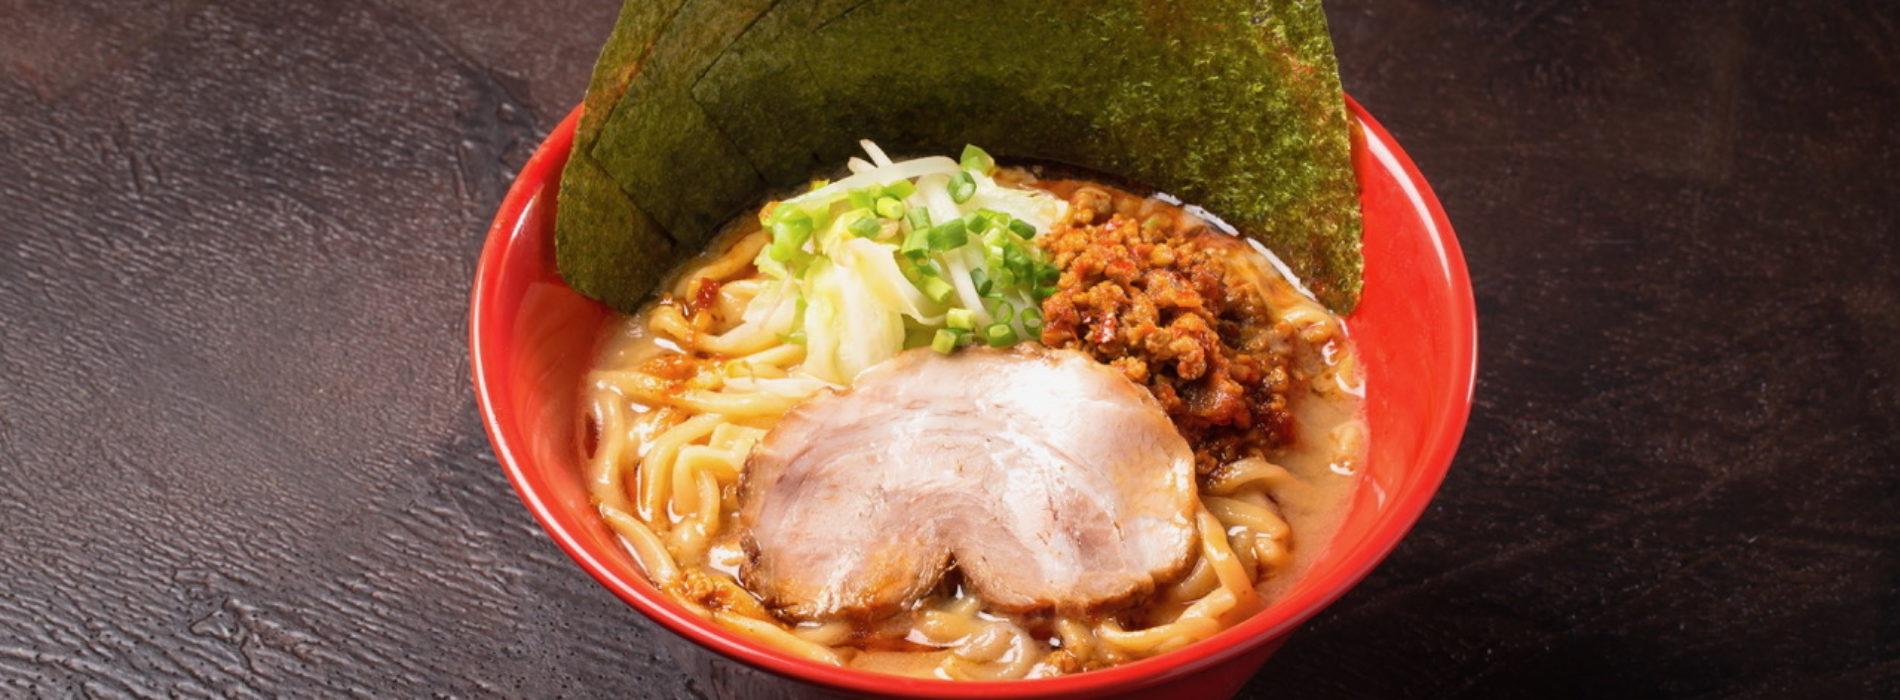 Ramen Bar Akira Torino, gyoza e takoyaki nel nuovo ristorante giapponese